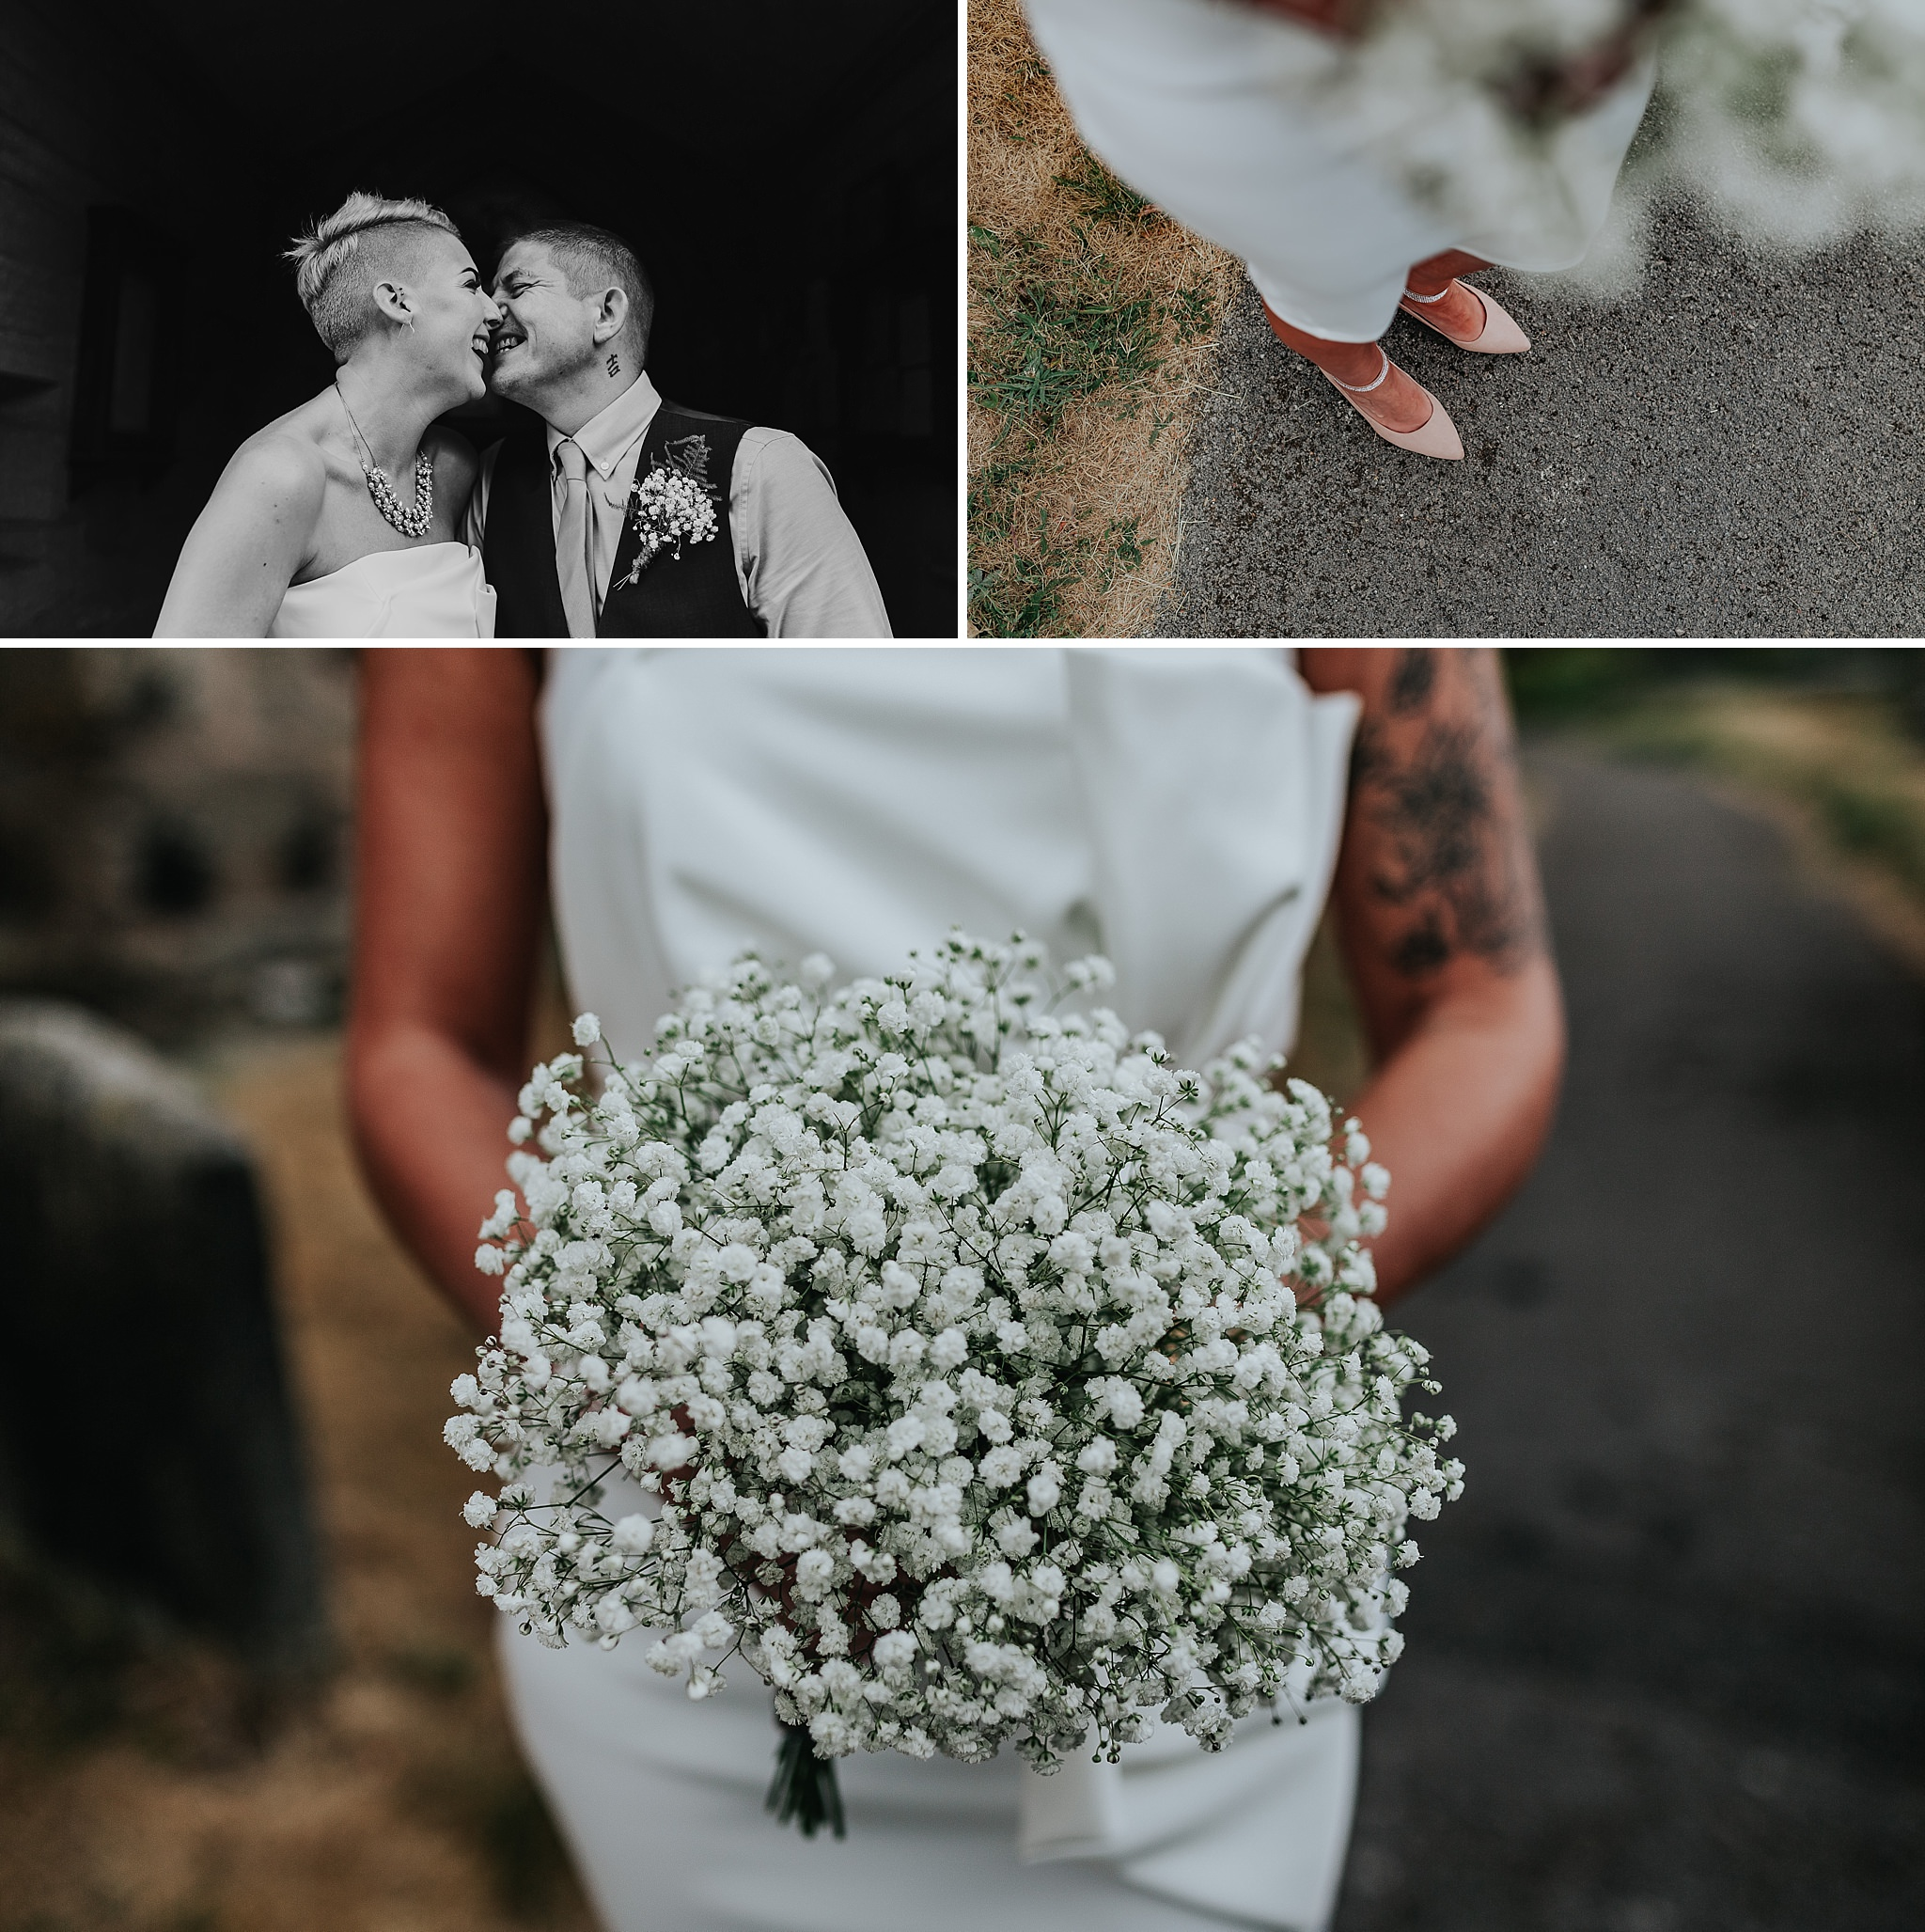 Documentary wedding photographer Staffordshire